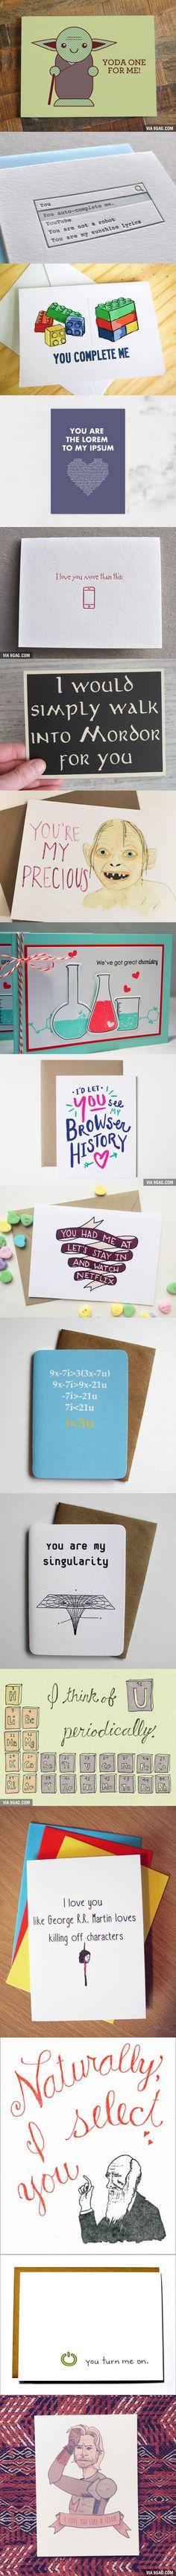 17 Nerdy Valentine's Day Cards